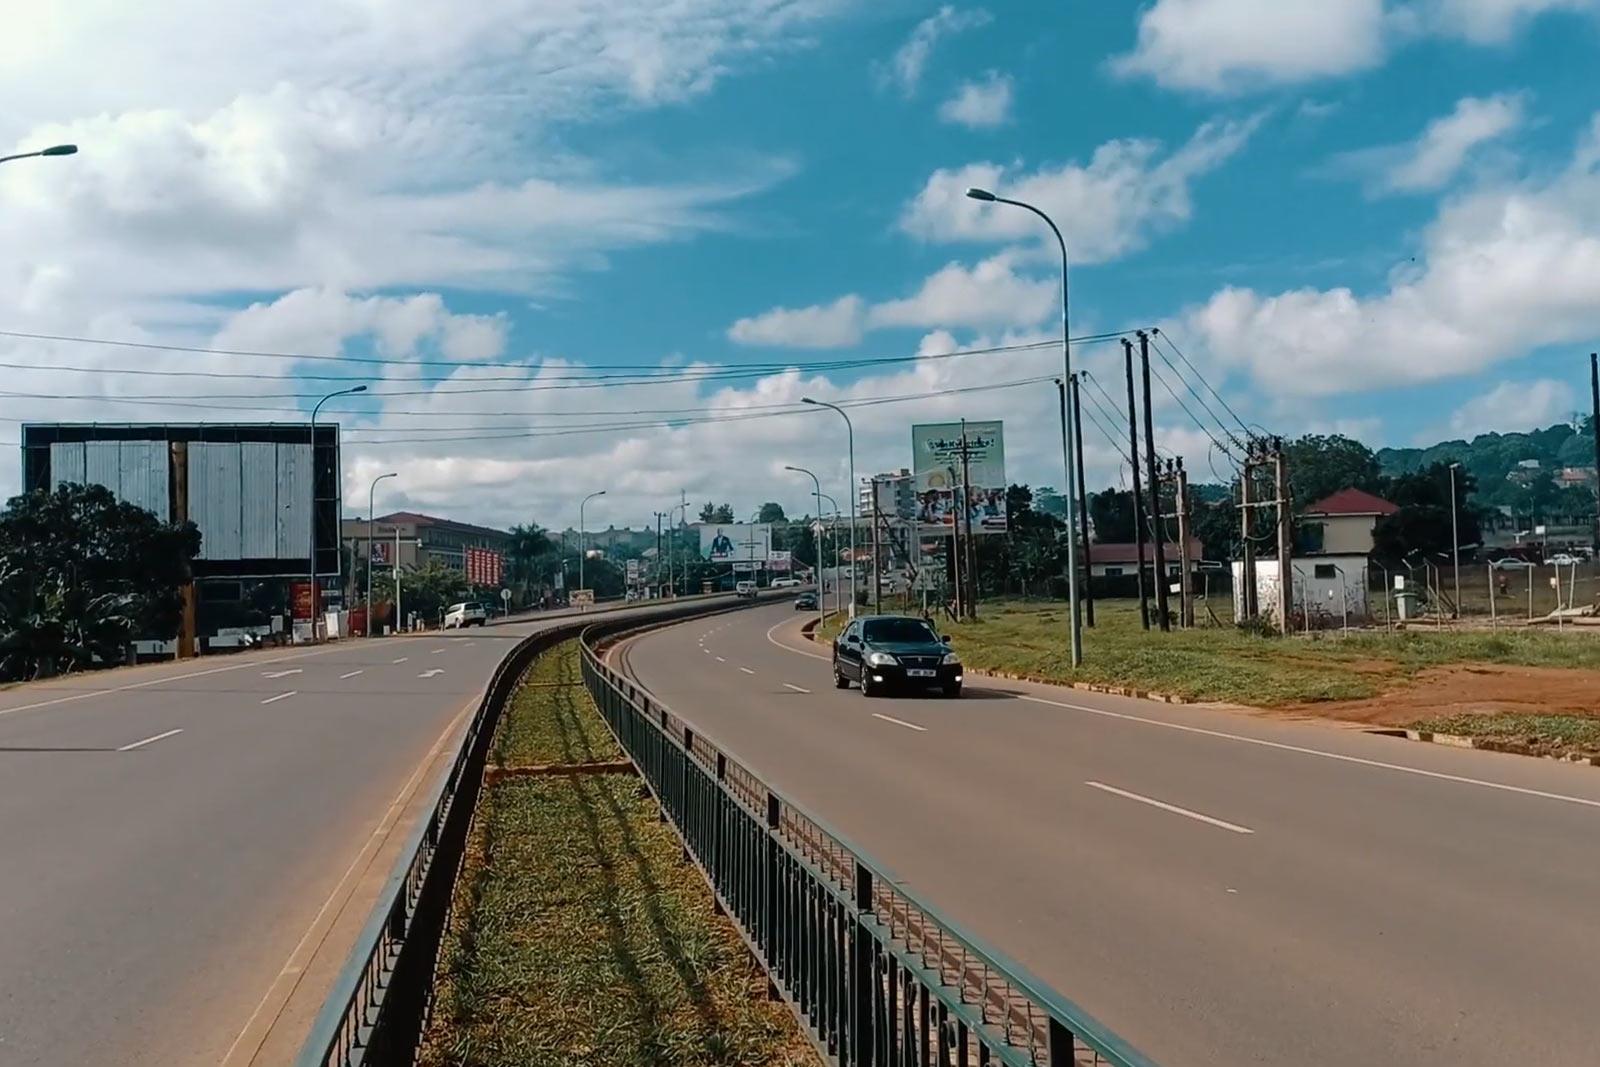 Day 4: Travel back to Kampala/Entebbe